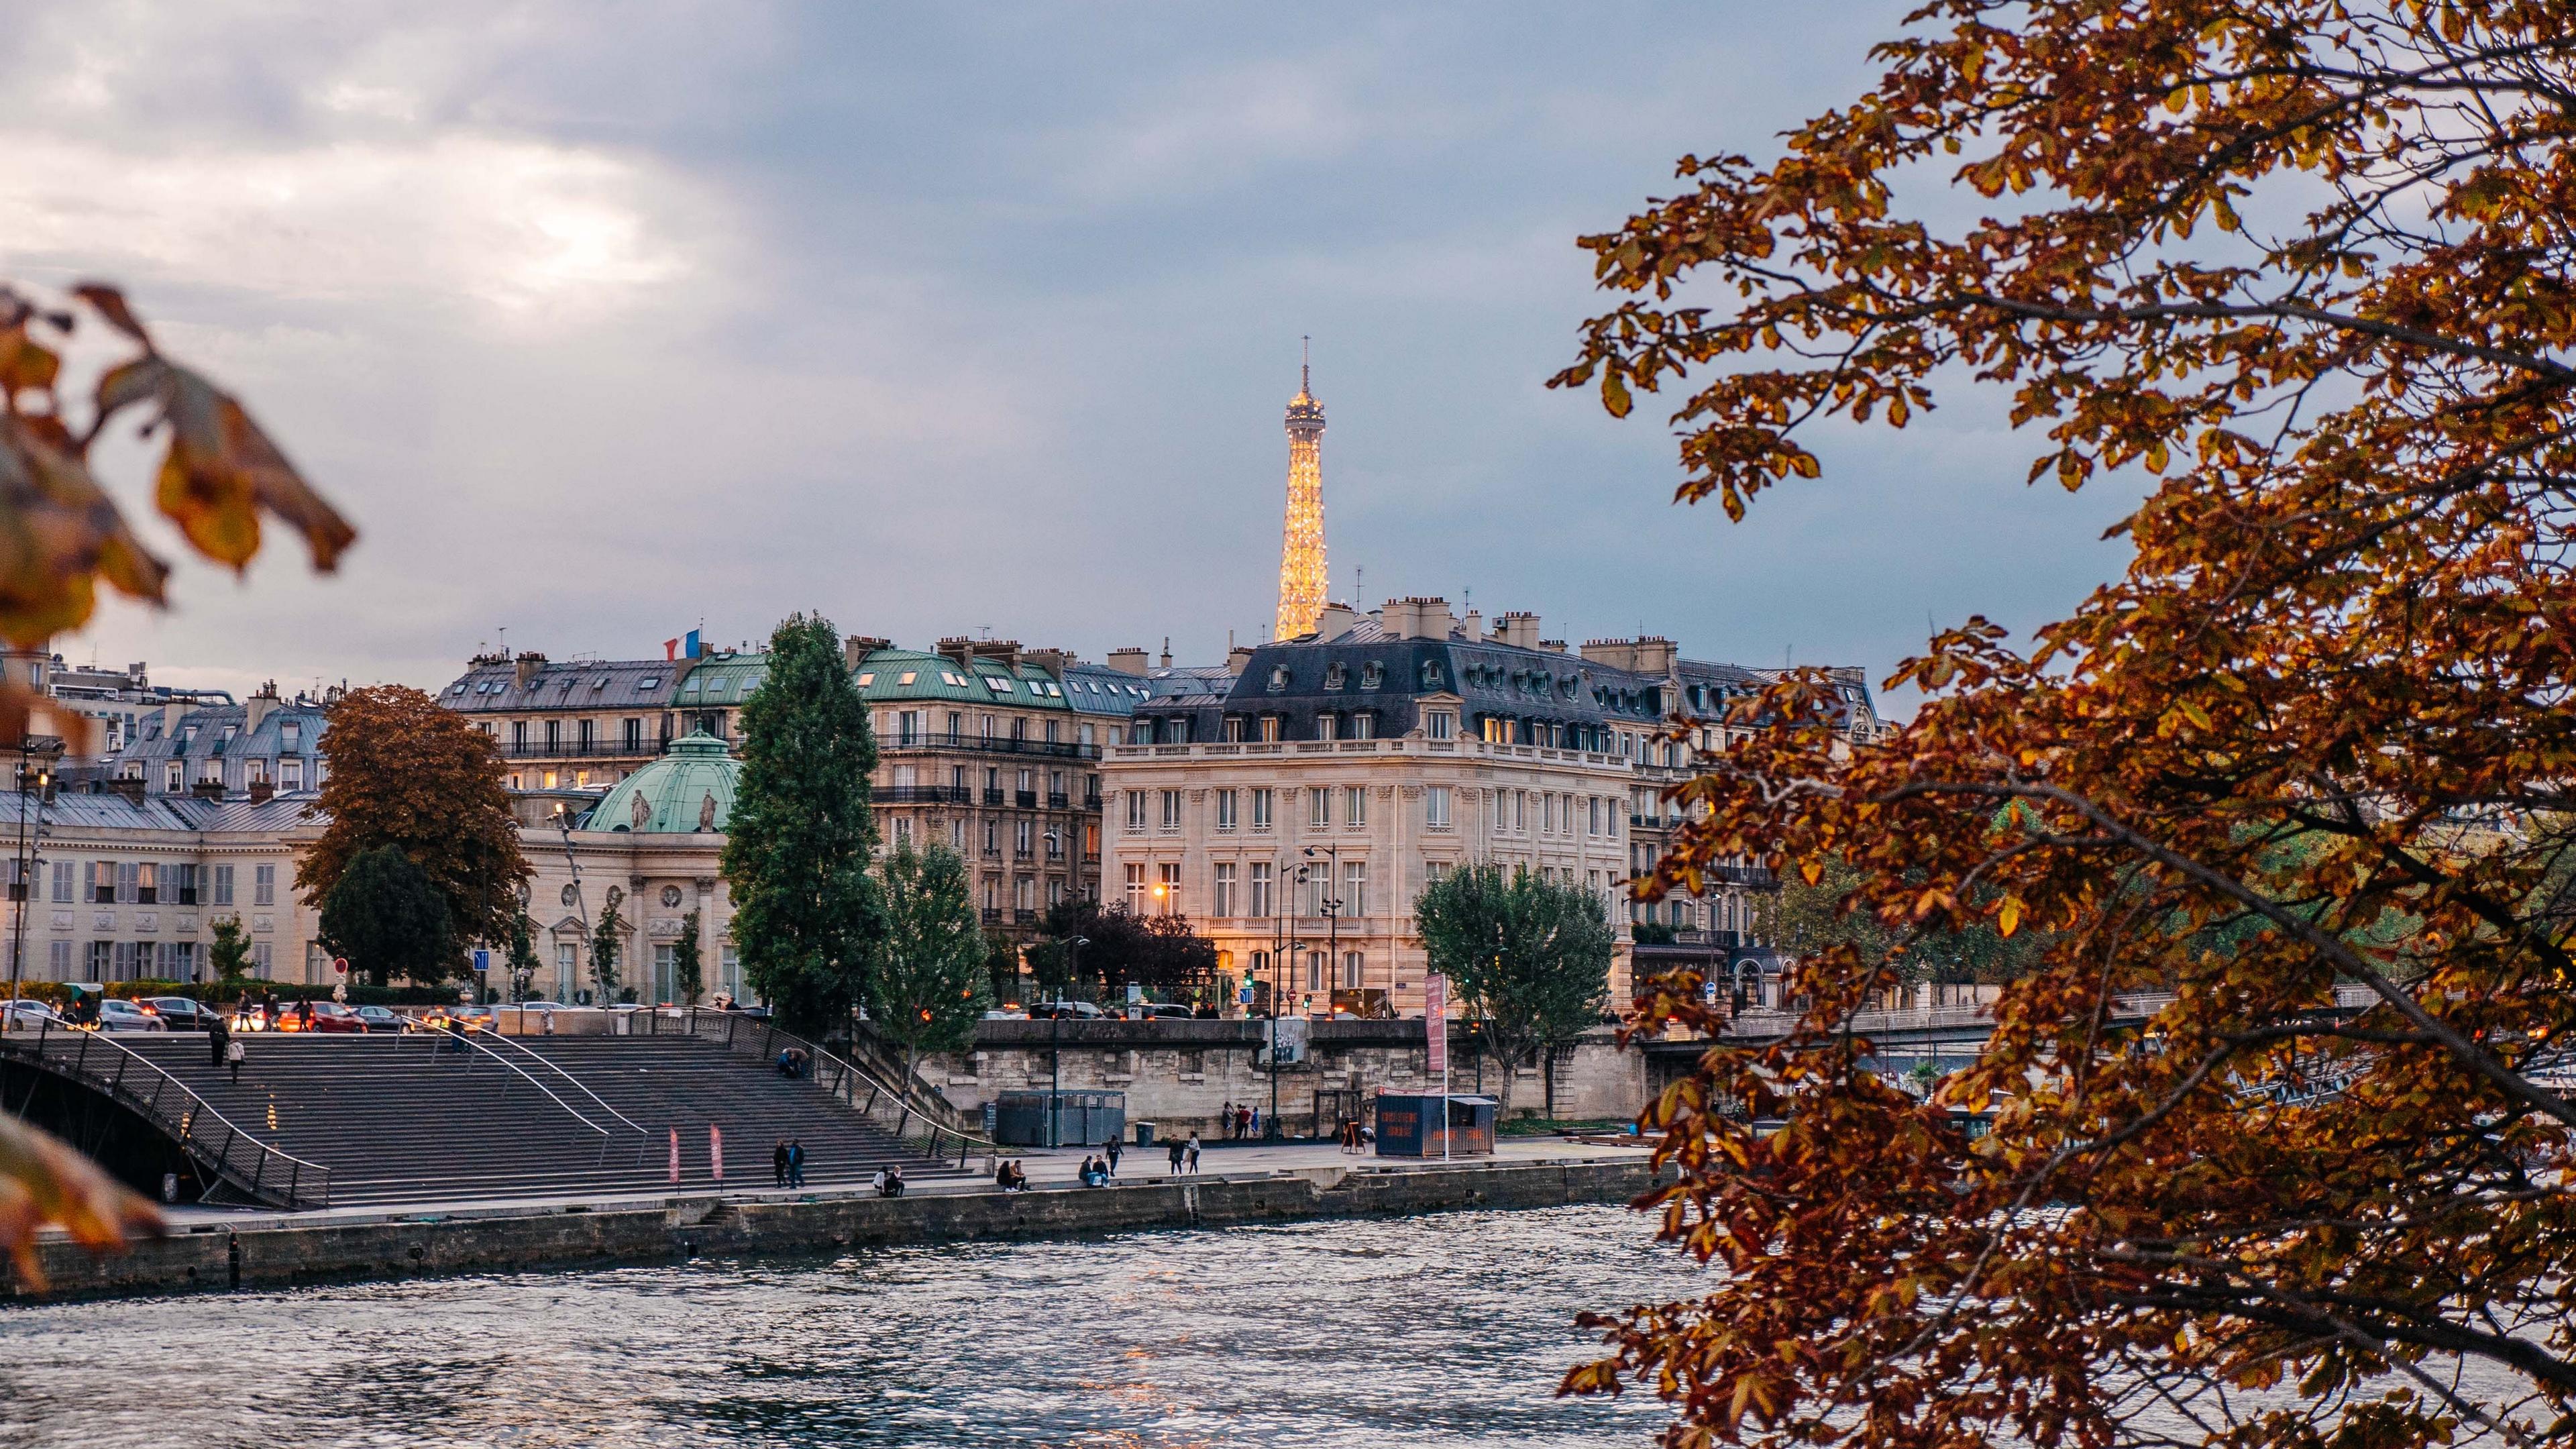 paris france river quay 4k 1538064905 - paris, france, river, quay 4k - River, Paris, France